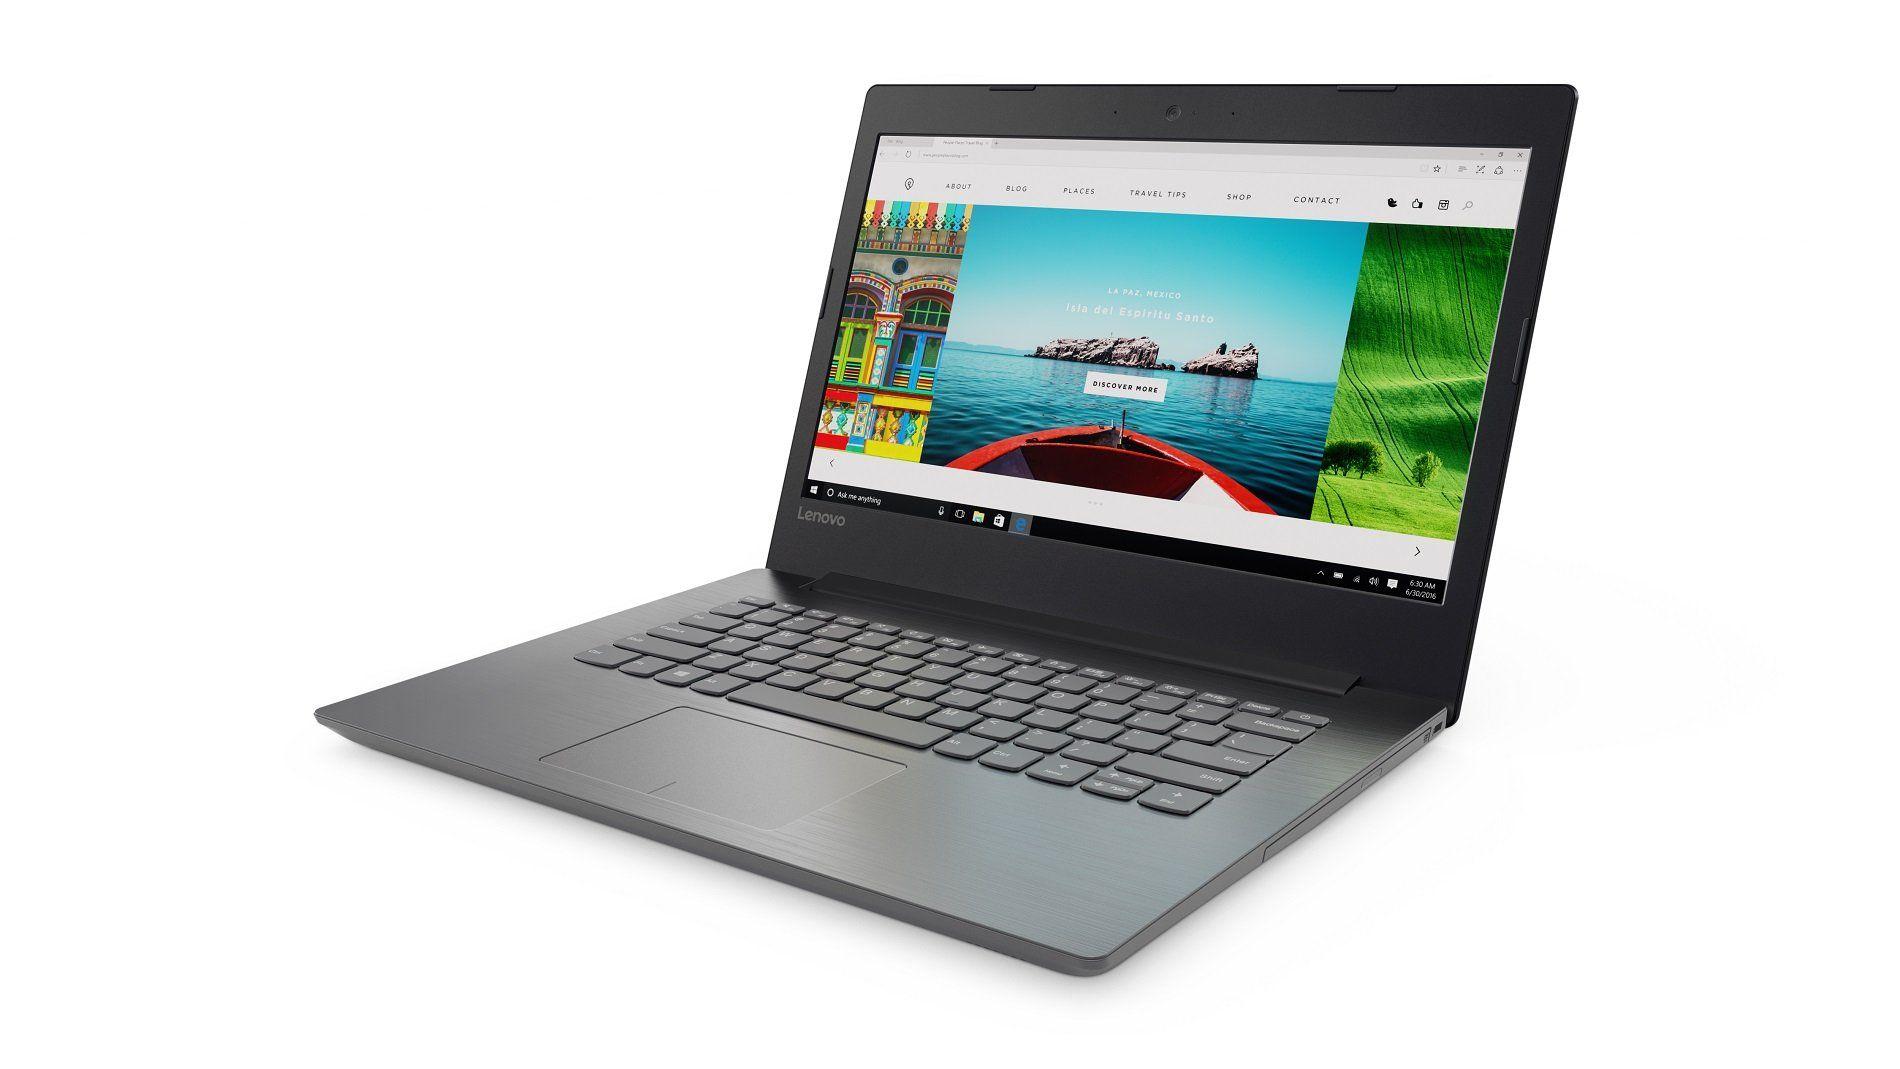 Notebook  Lenovo B320-14Ikbn Ci3 6006U 2.0Ghz/500Gb /4Gb /Tela 14 /W10Home Preto